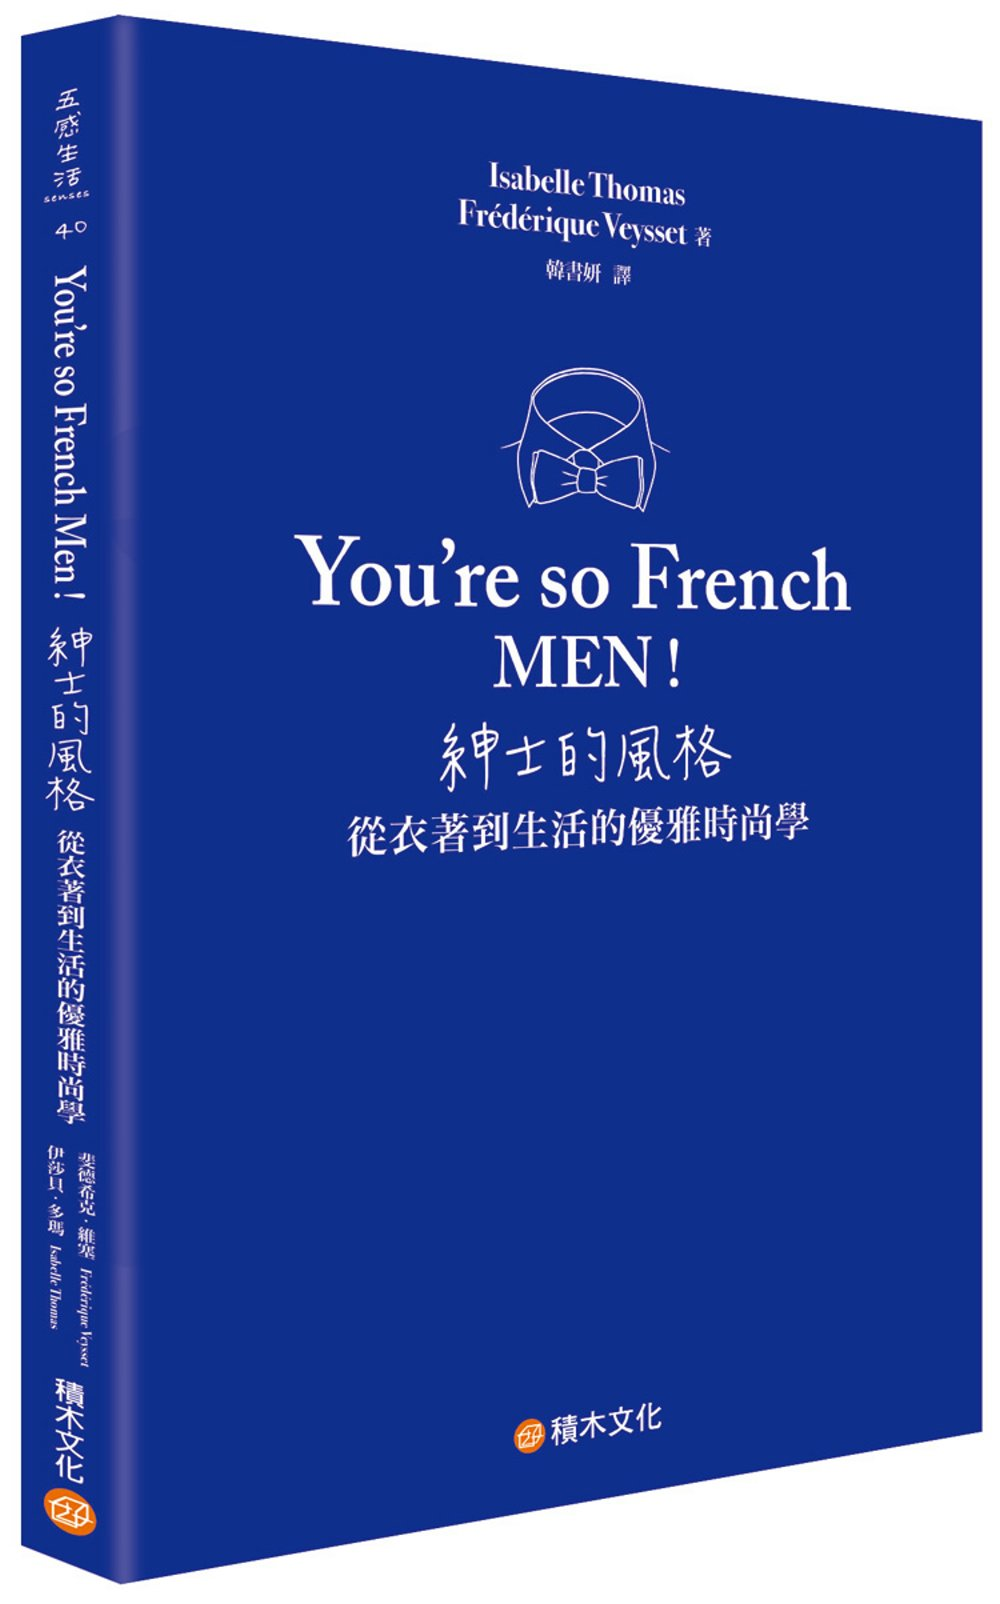 You're so French Men!紳士的風格:從衣著到生活的優雅時尚學